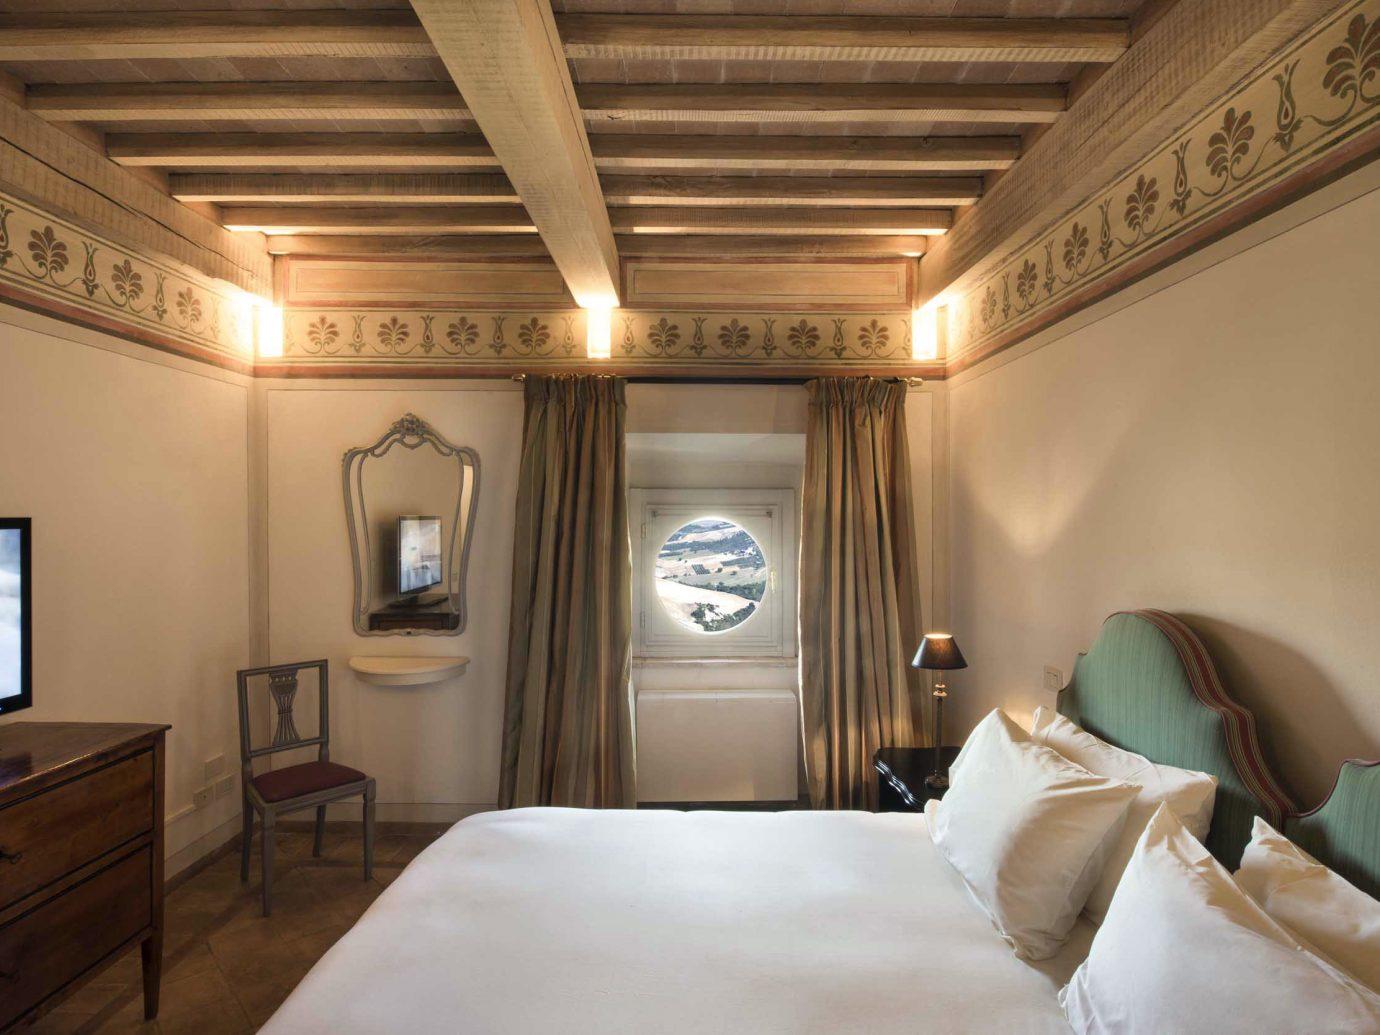 Bedroom europe Honeymoon Hotels Italy Luxury Romance Romantic indoor wall ceiling room bed property hotel scene estate interior design Design Suite furniture